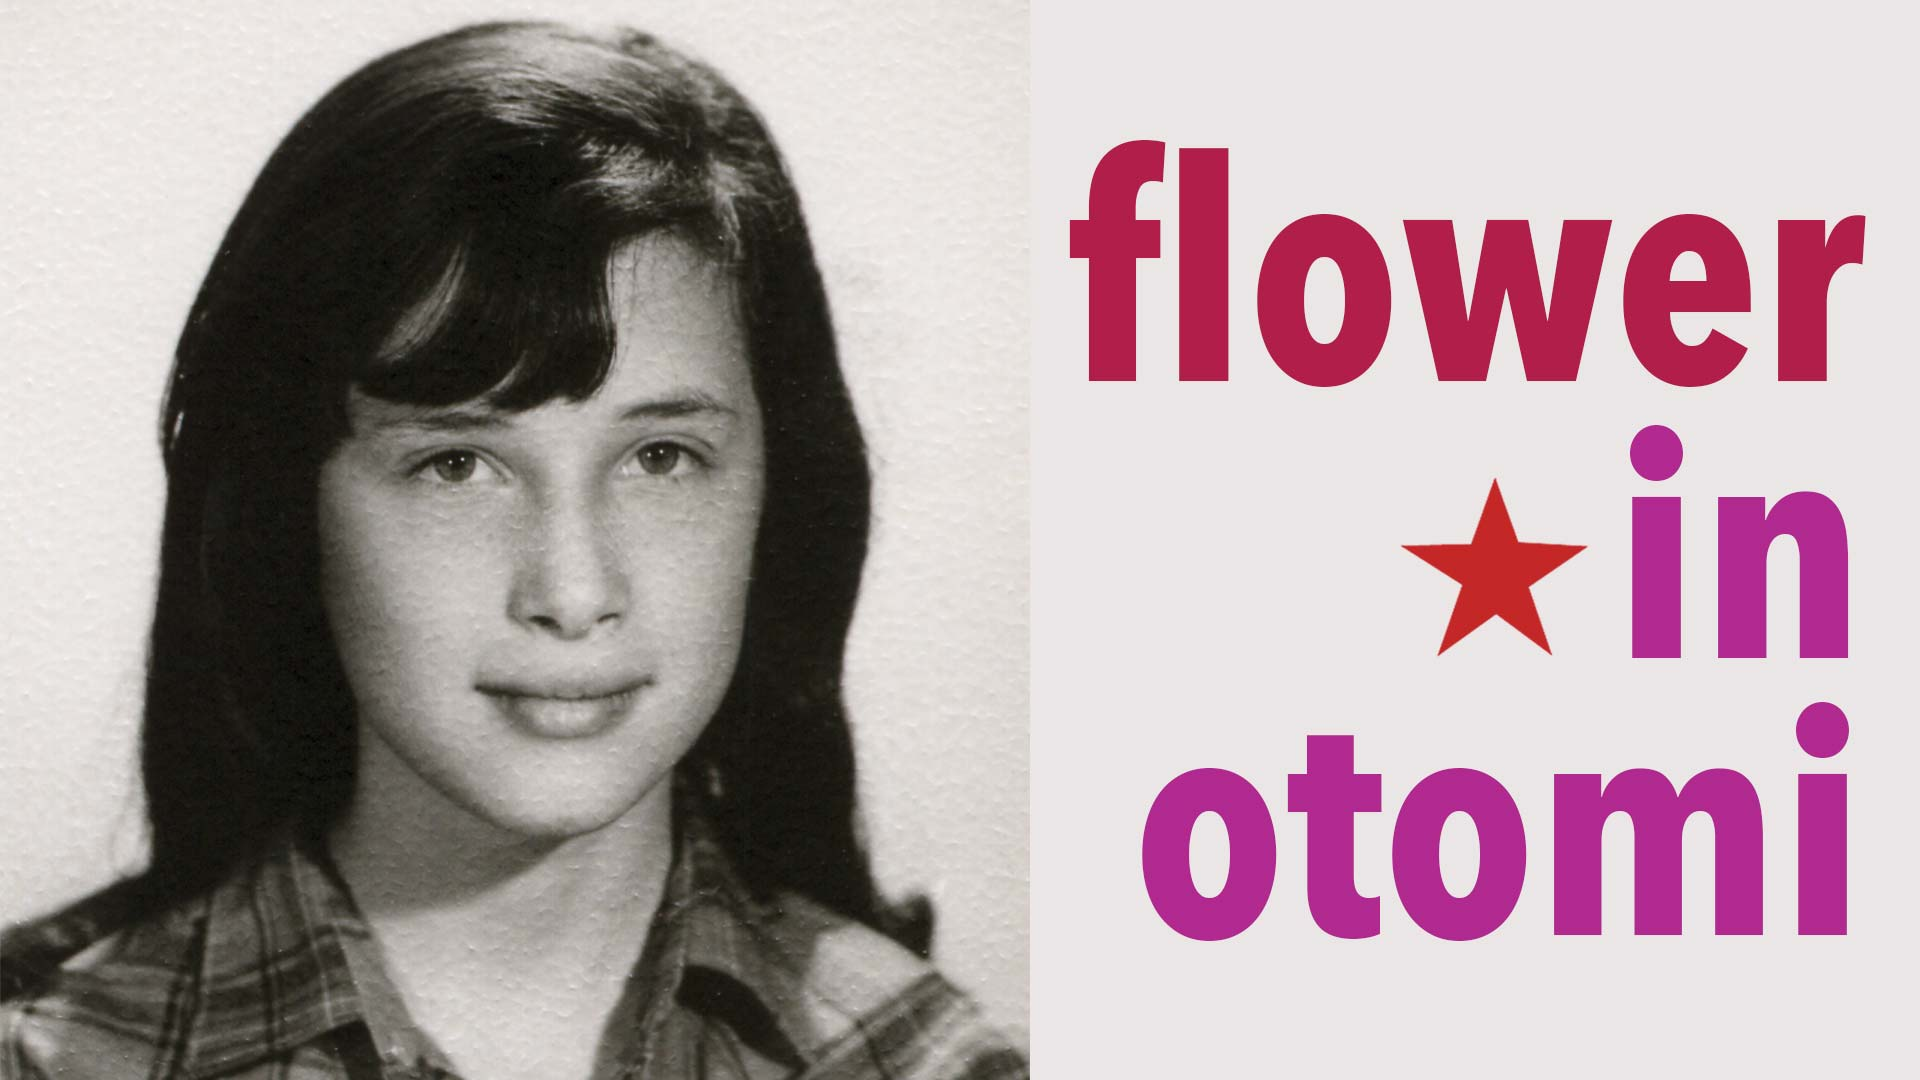 Flower in Otomi - image